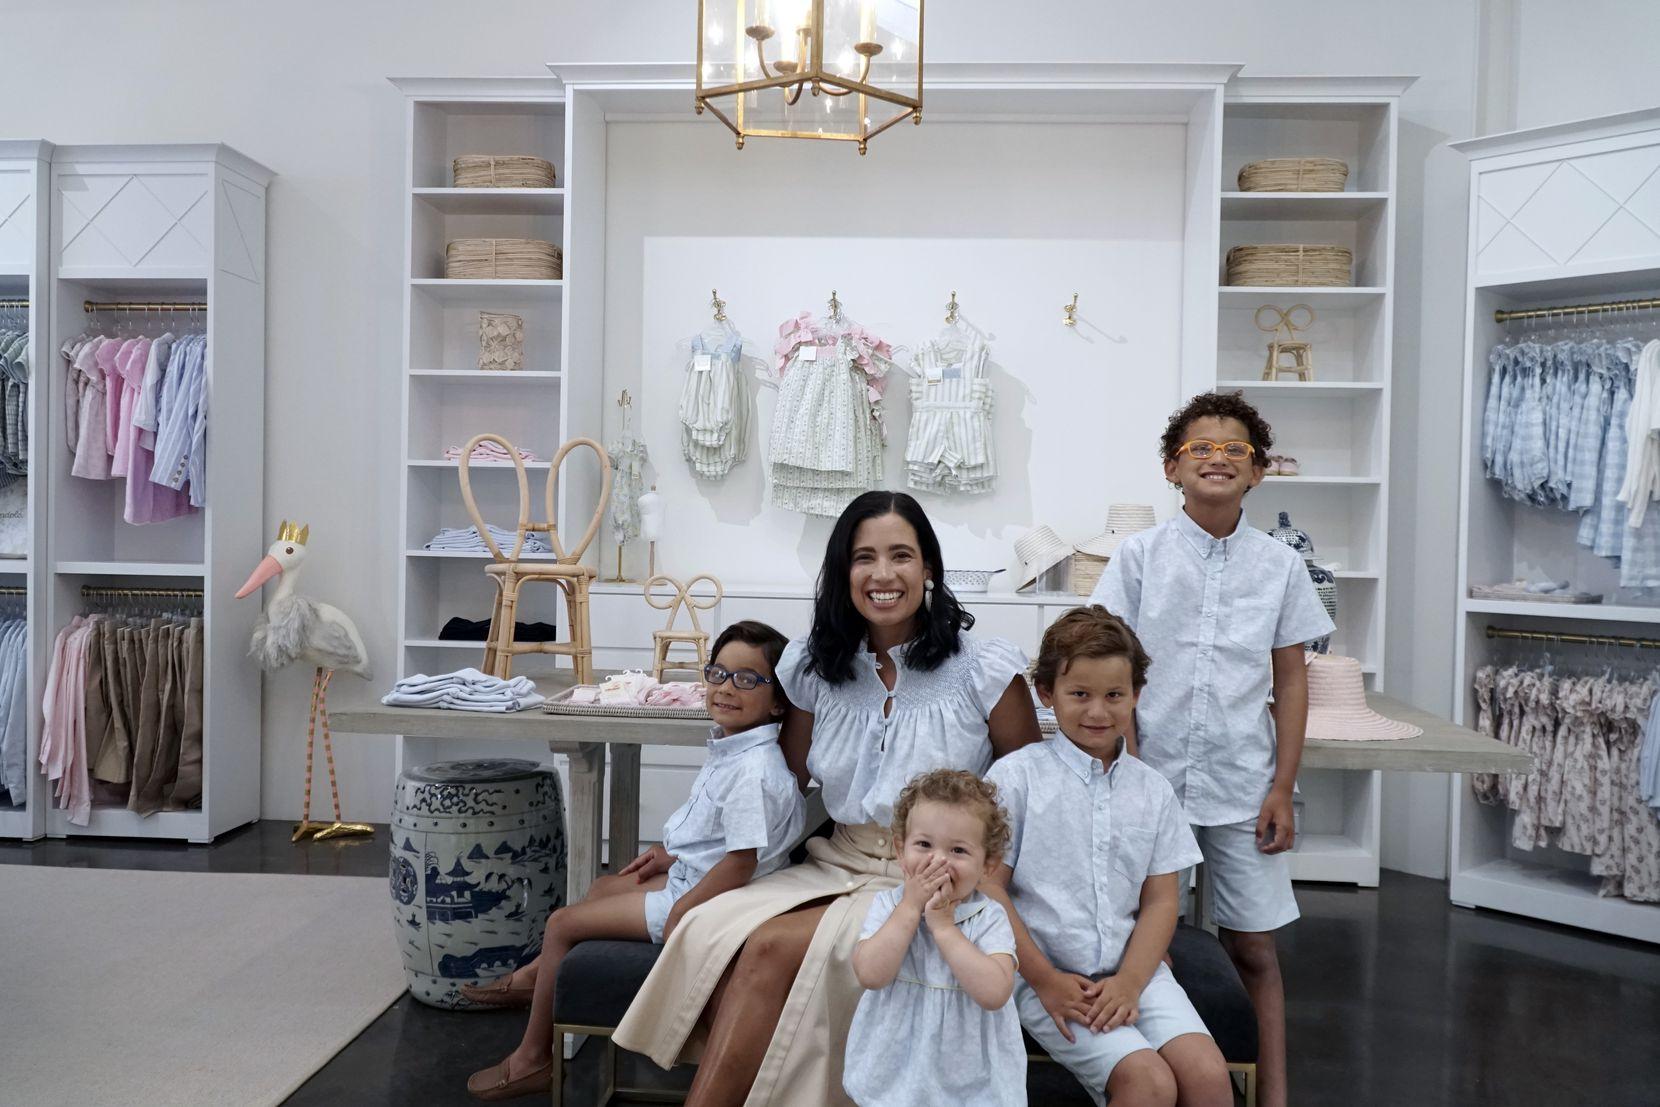 Dondolo owner Catalina Gonzalez gathers with her children Luis Jorba (from left), 5; Roberto Jorba, 2; Jaime Jorba,7; and Santiago Jorba, 10, at her store in Dallas.